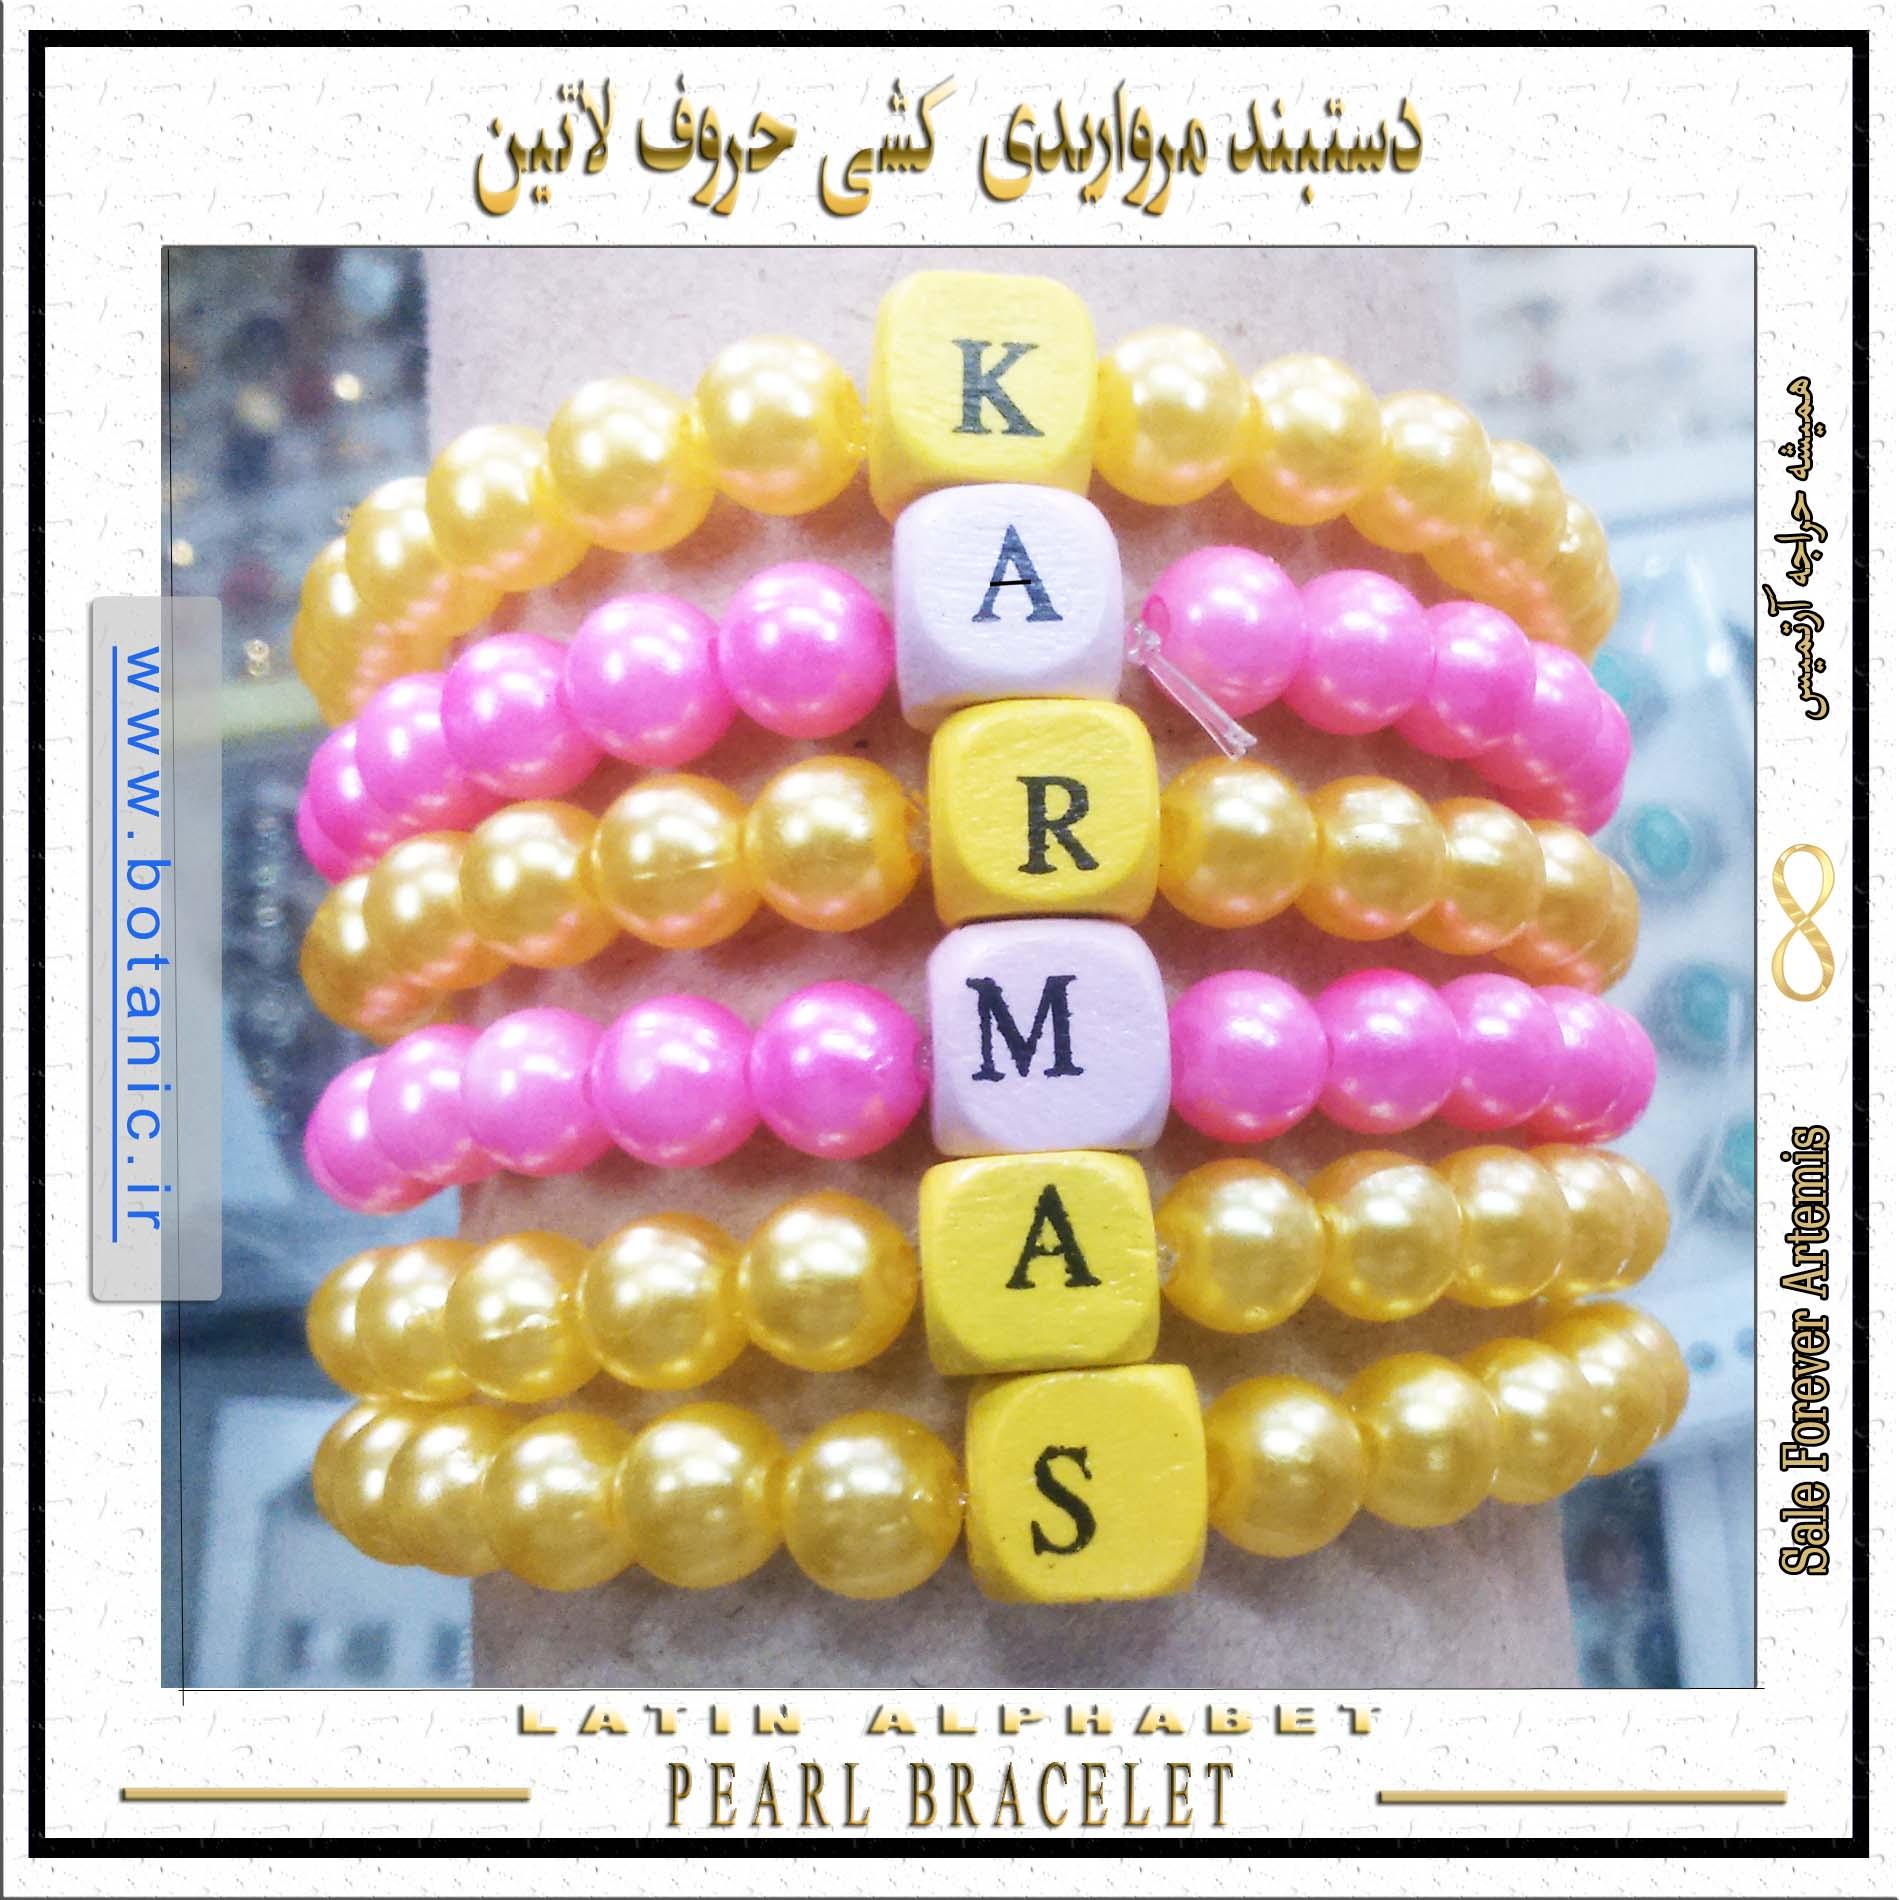 Latin Alphabet Pearl Bracelet